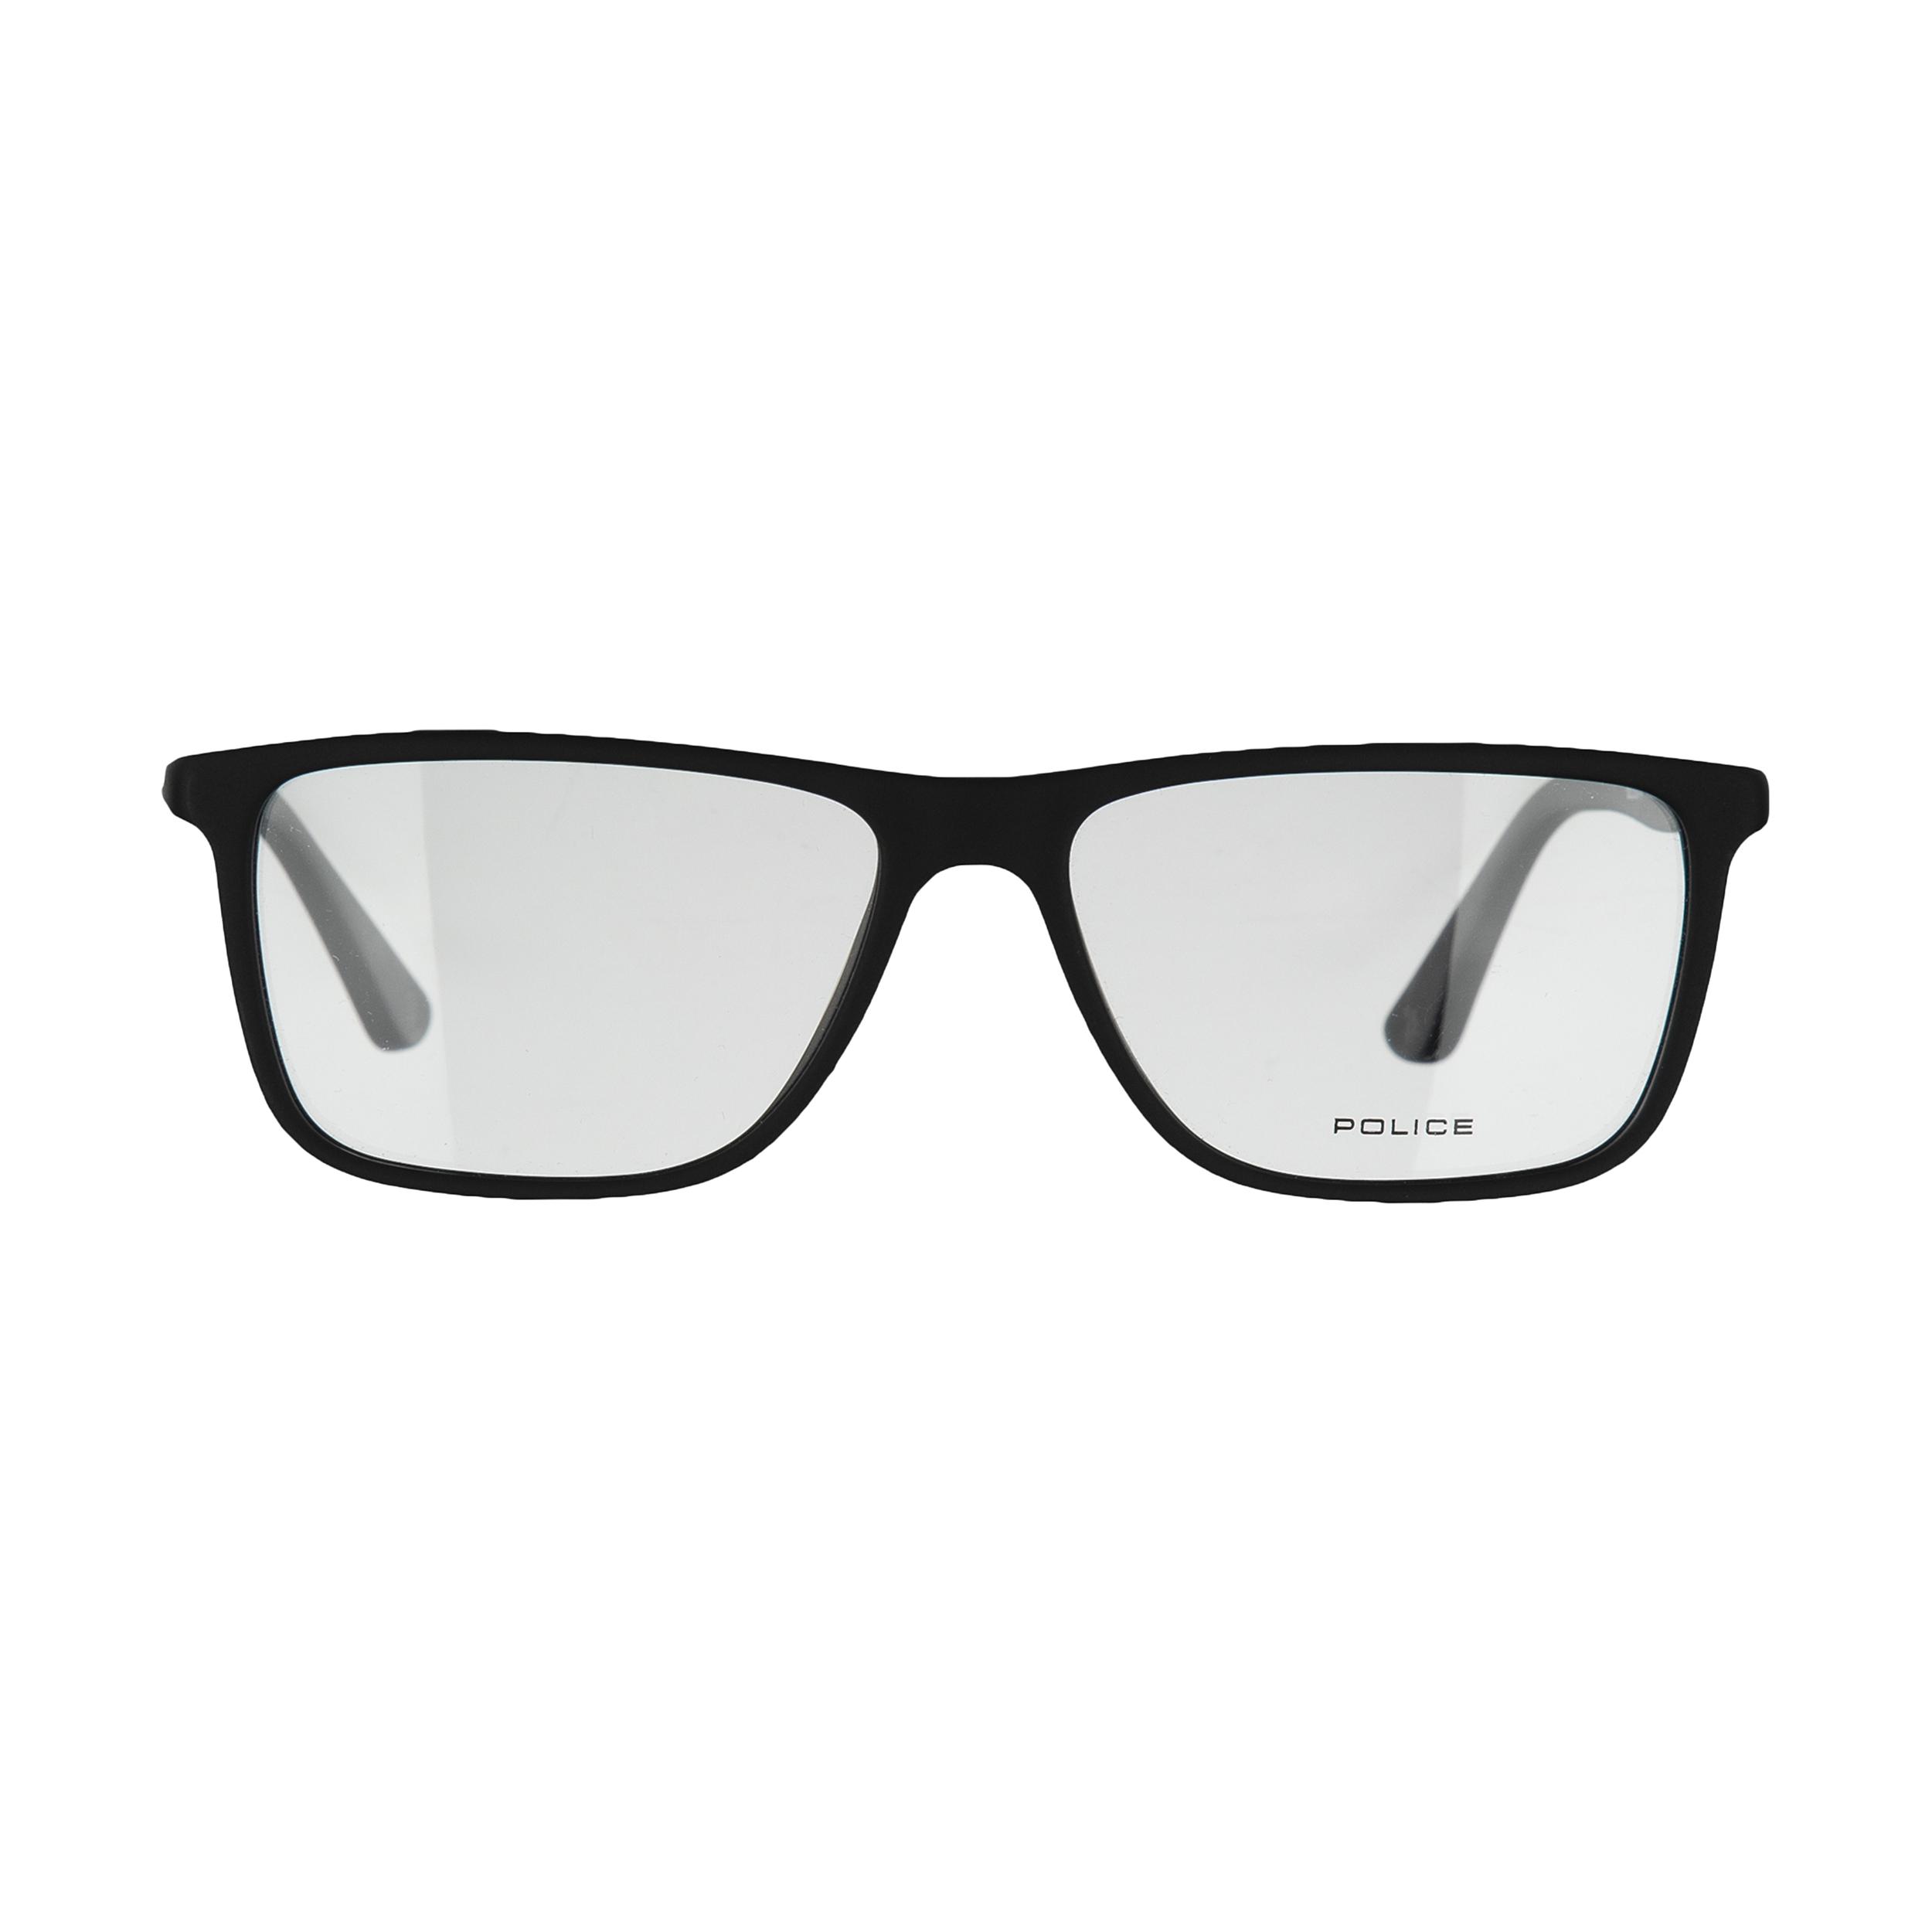 عینک طبی پلیس مدل VPL466 0703